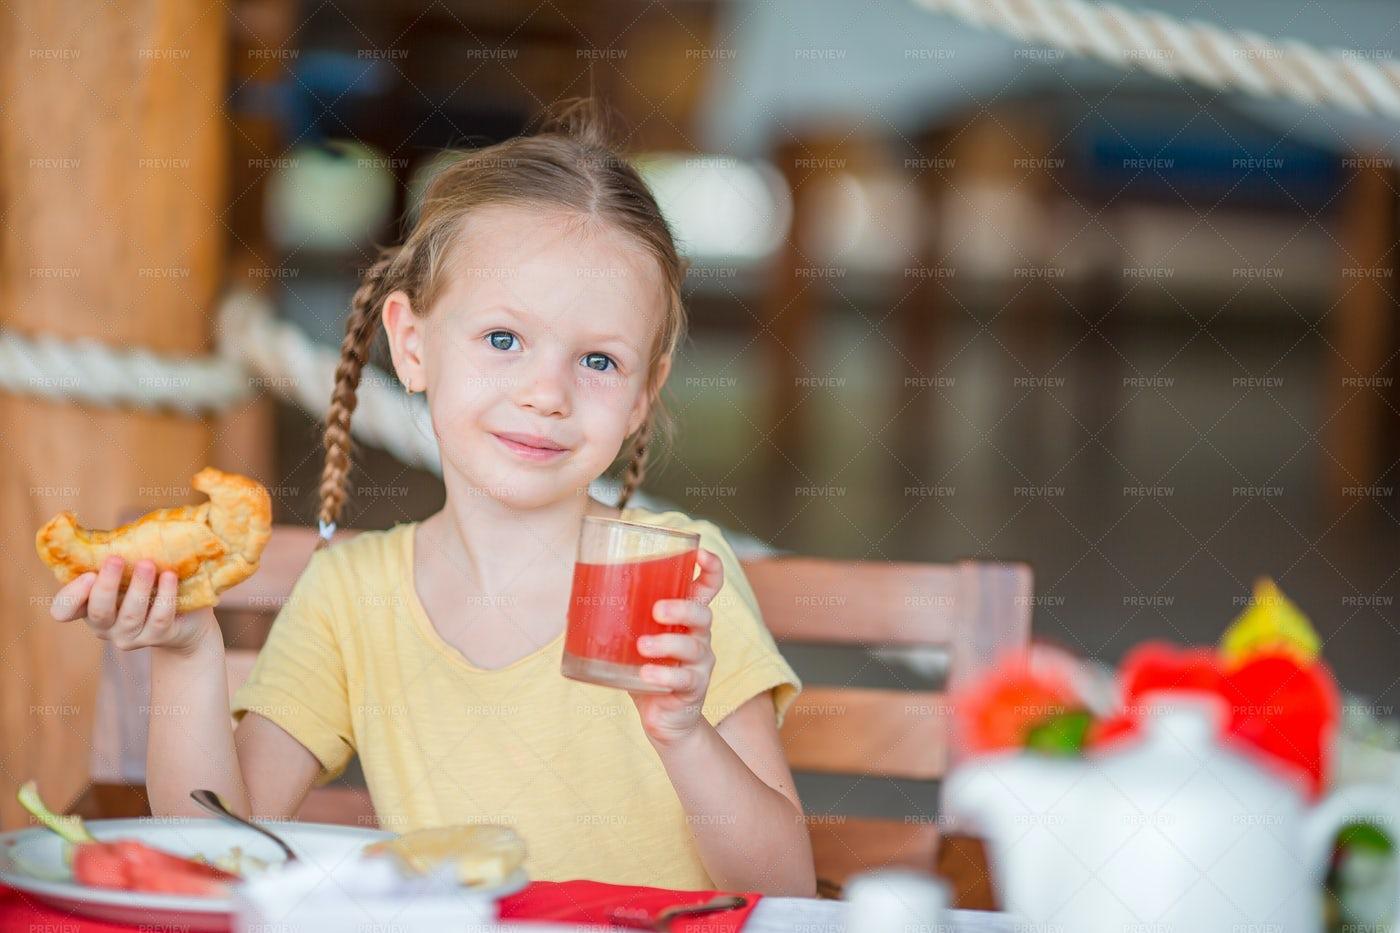 Little Girl Eating On A Restaurant: Stock Photos